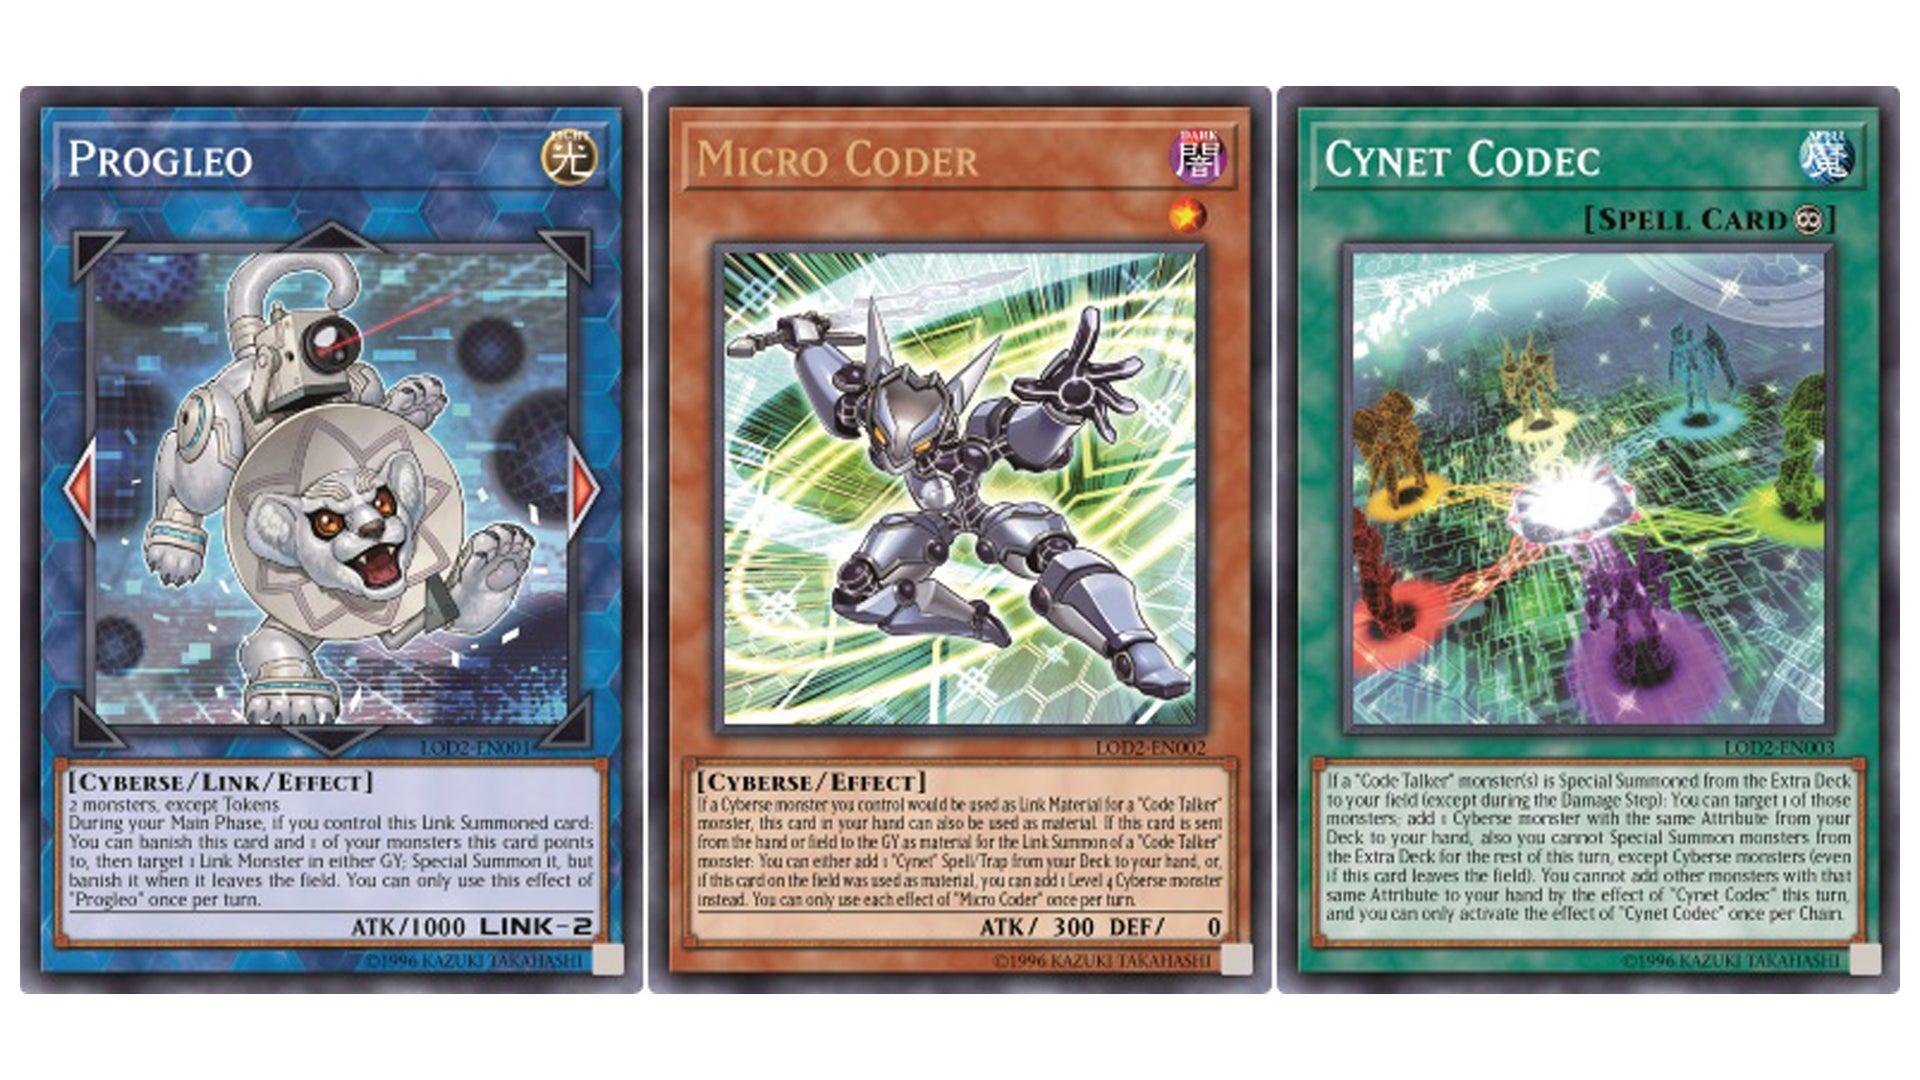 yu-gi-oh-tcg-promo-cards.jpg